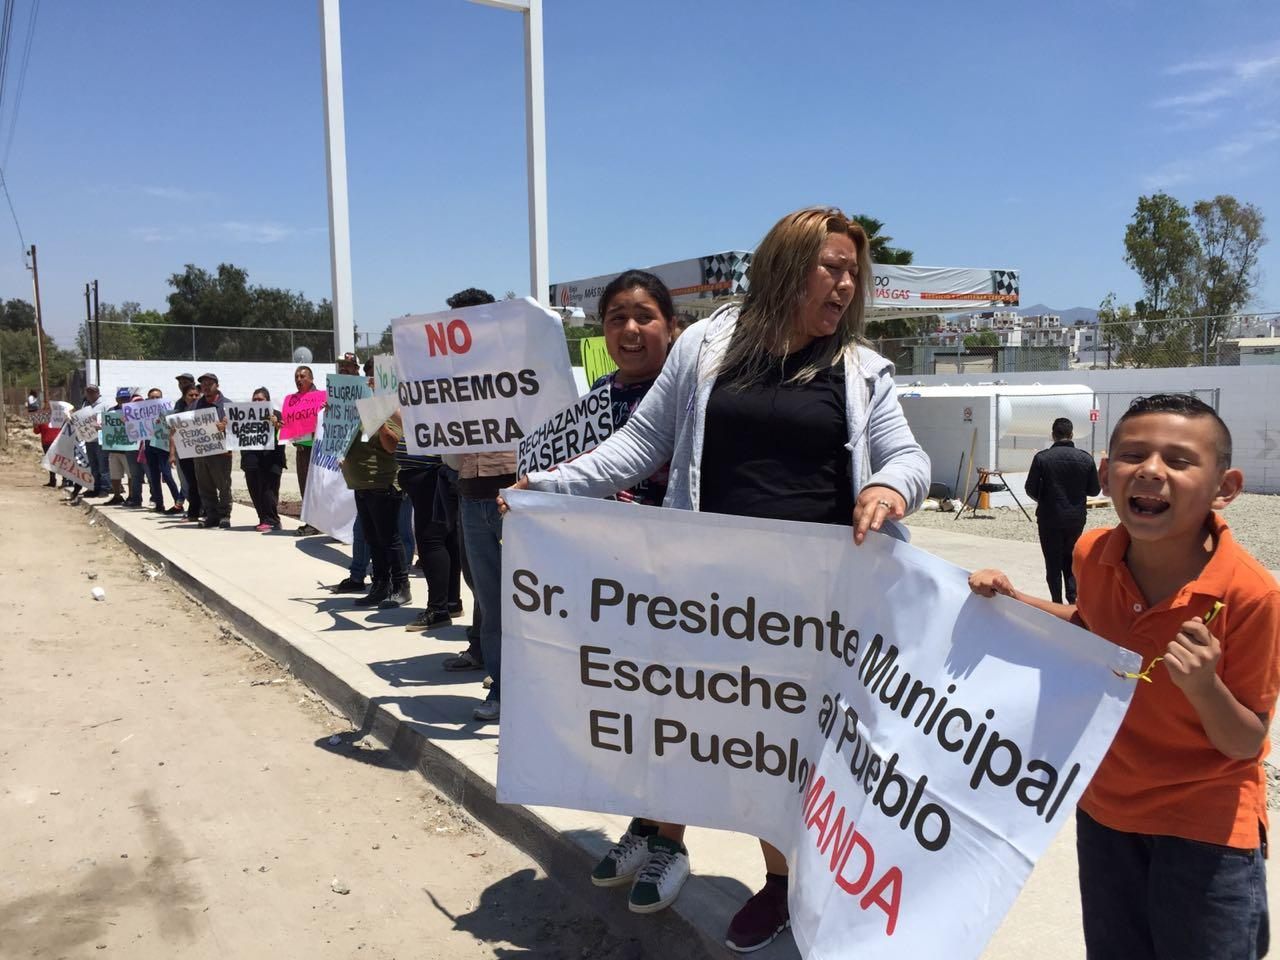 PROTESTAS VECINOS DISTRIBUIDORA DE BAJA ENERGY GAS, CERCA DE CENTRO ESCOLAR